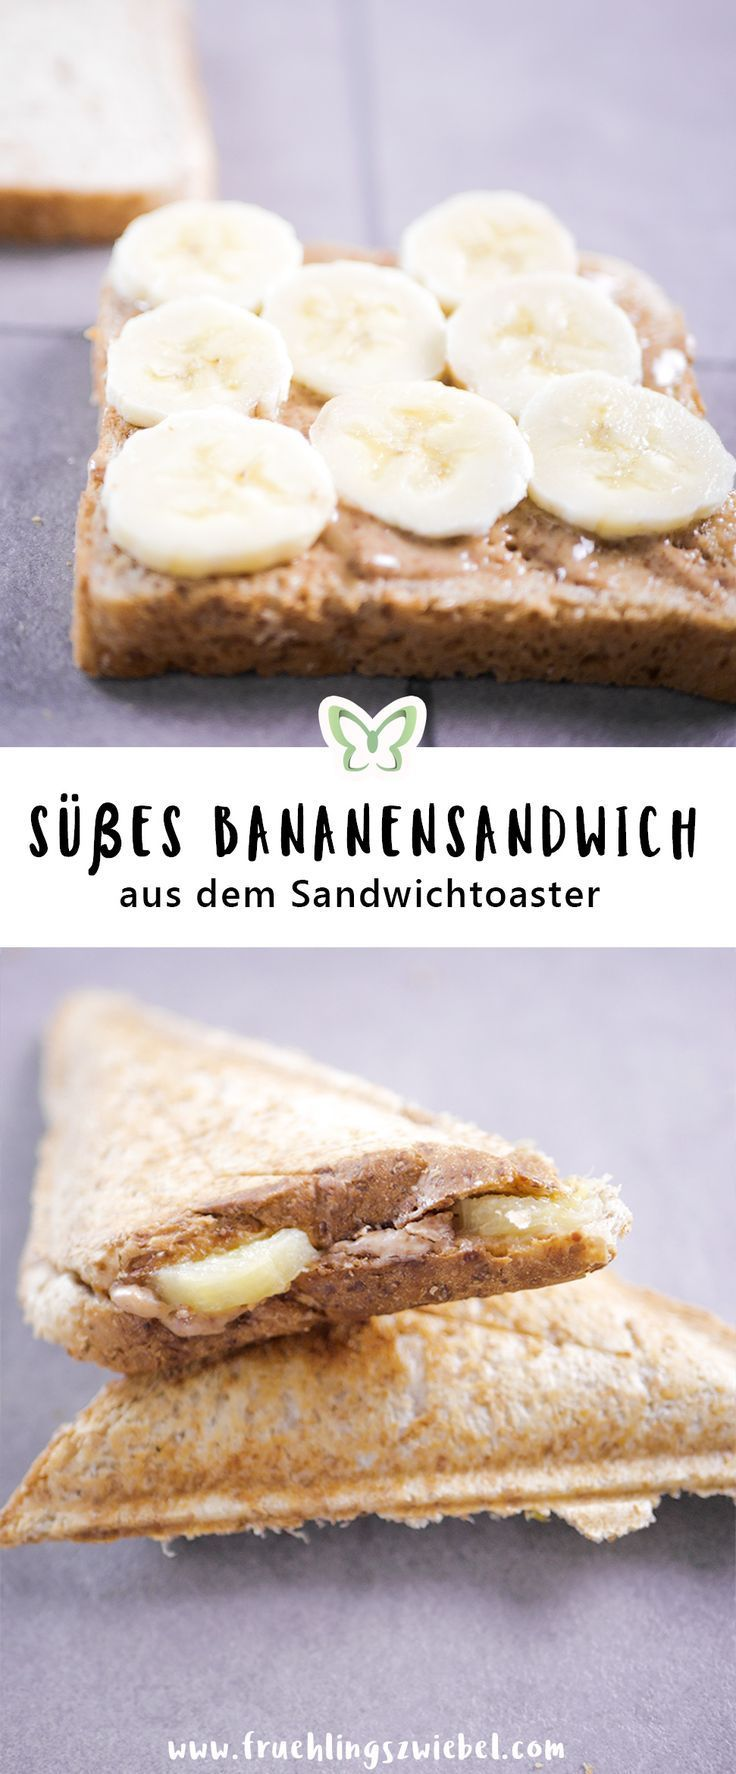 Sandwichmaker Rezepte – 4 gesunde Sandwich Toasts Ideen